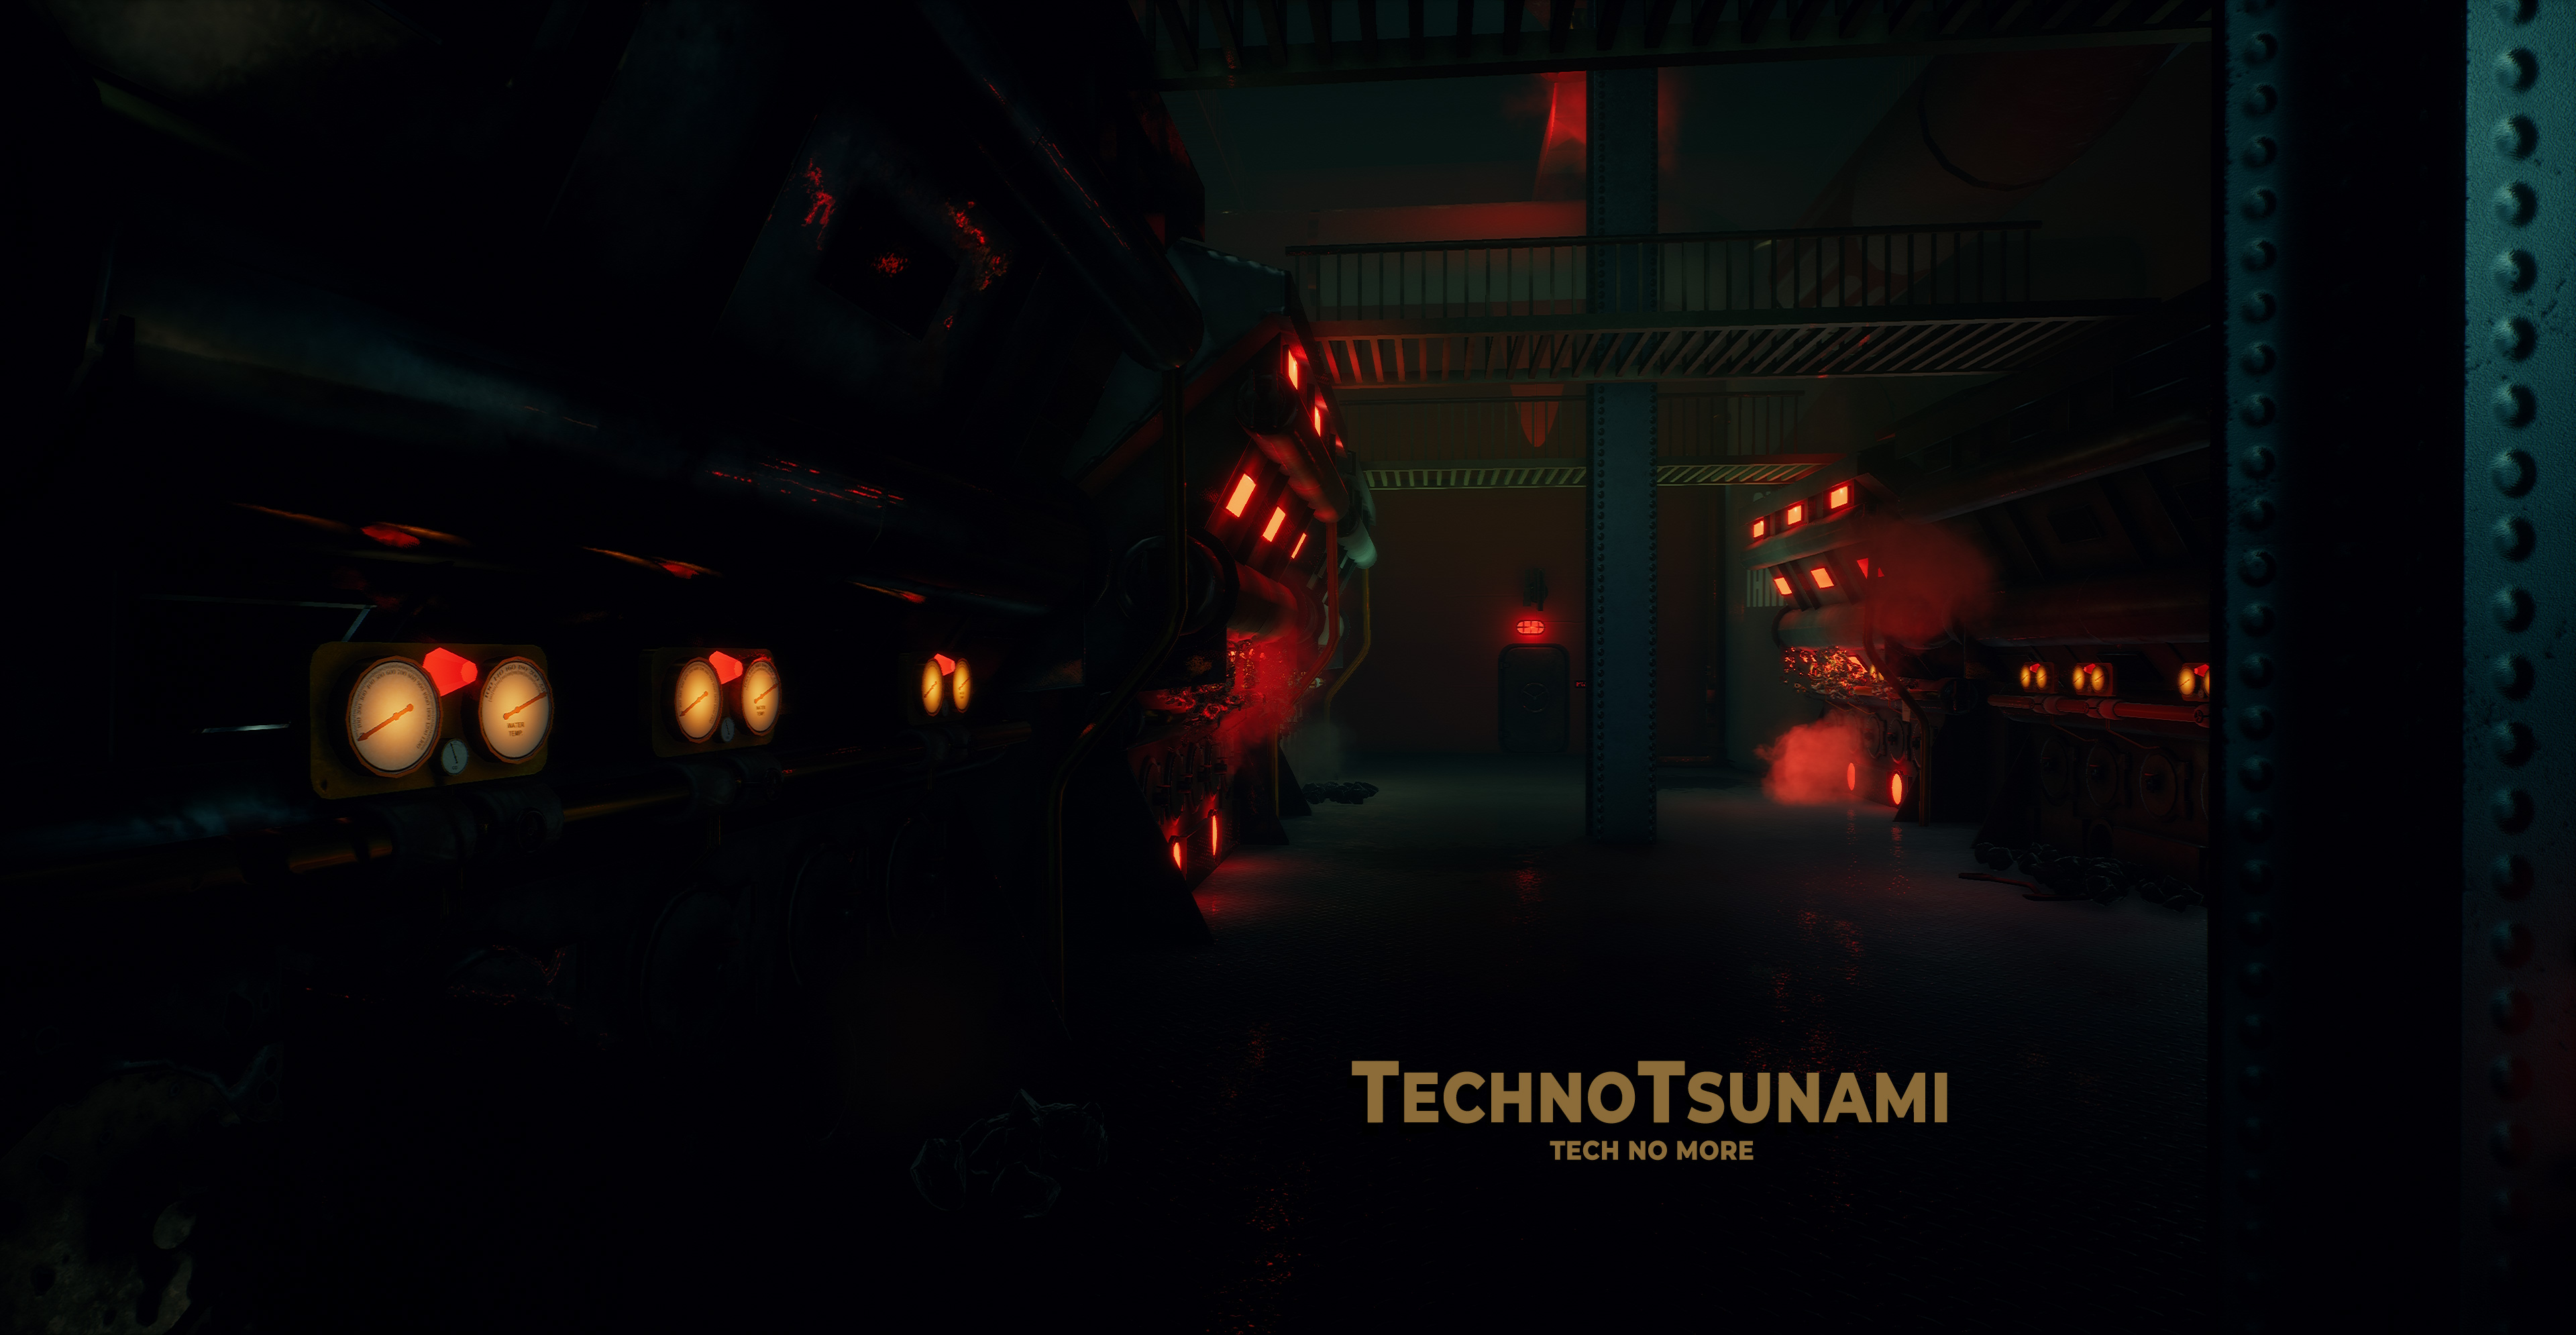 TechnoTsunami Boiler Room